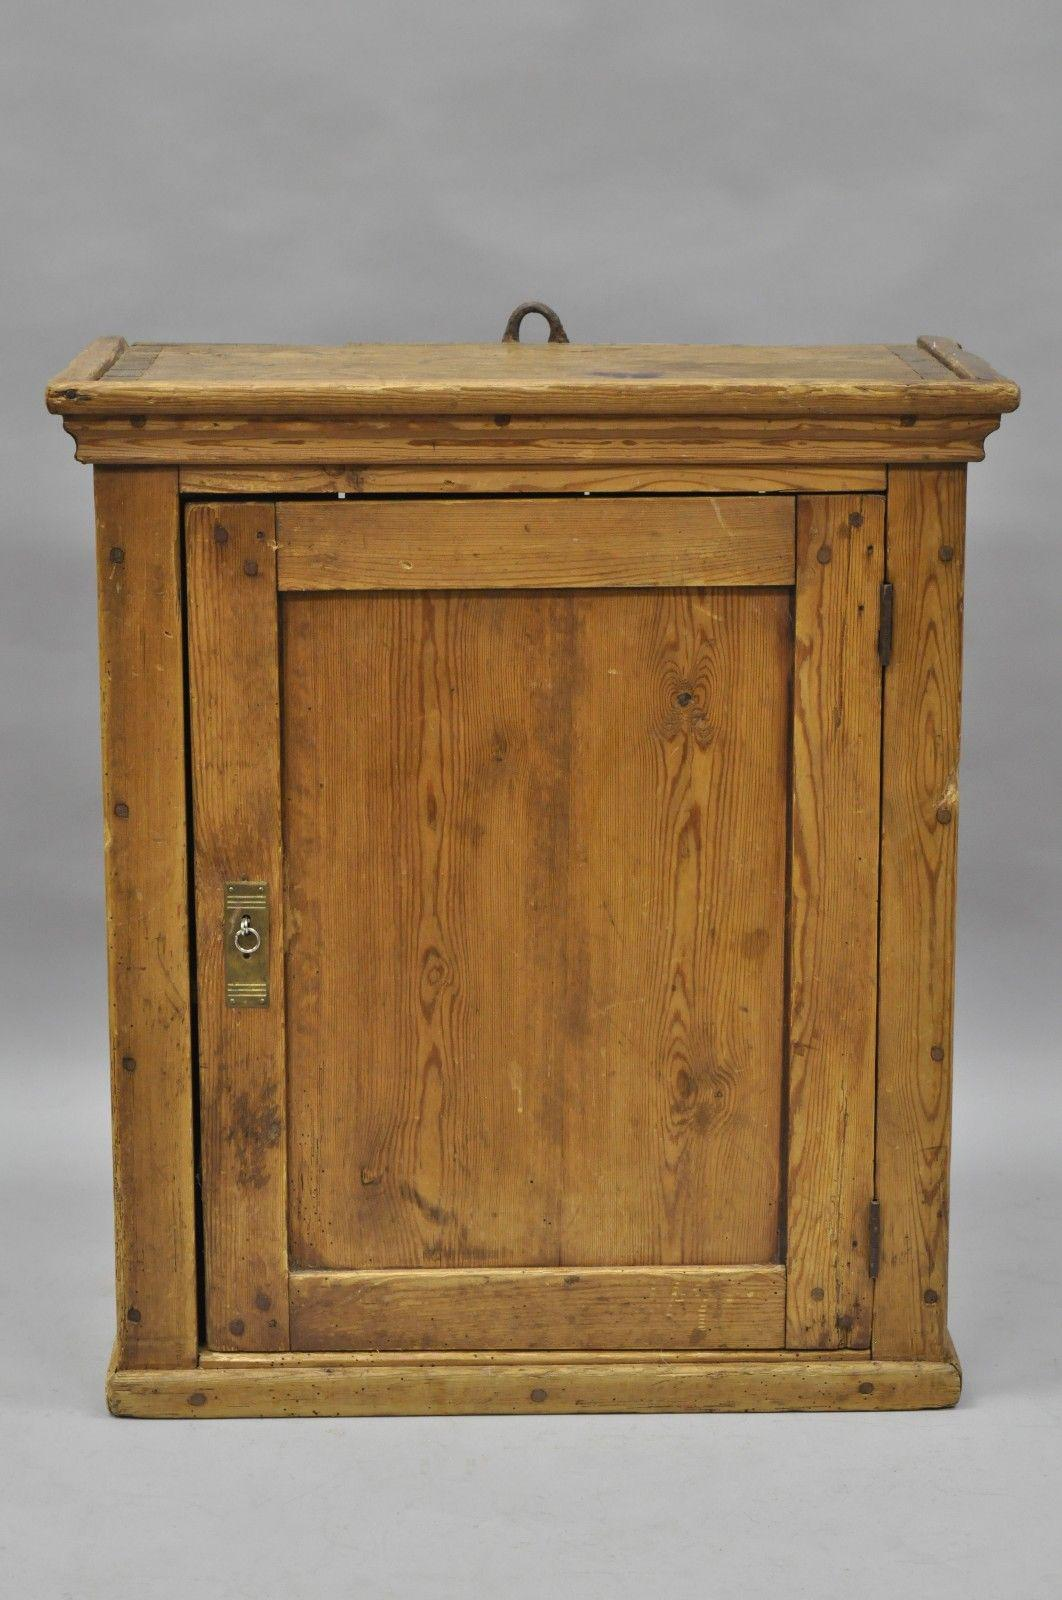 Item: Antique Primitive / Rustic Pine Wood Large Wall Hanging Cabinet  Details: Solid Wood